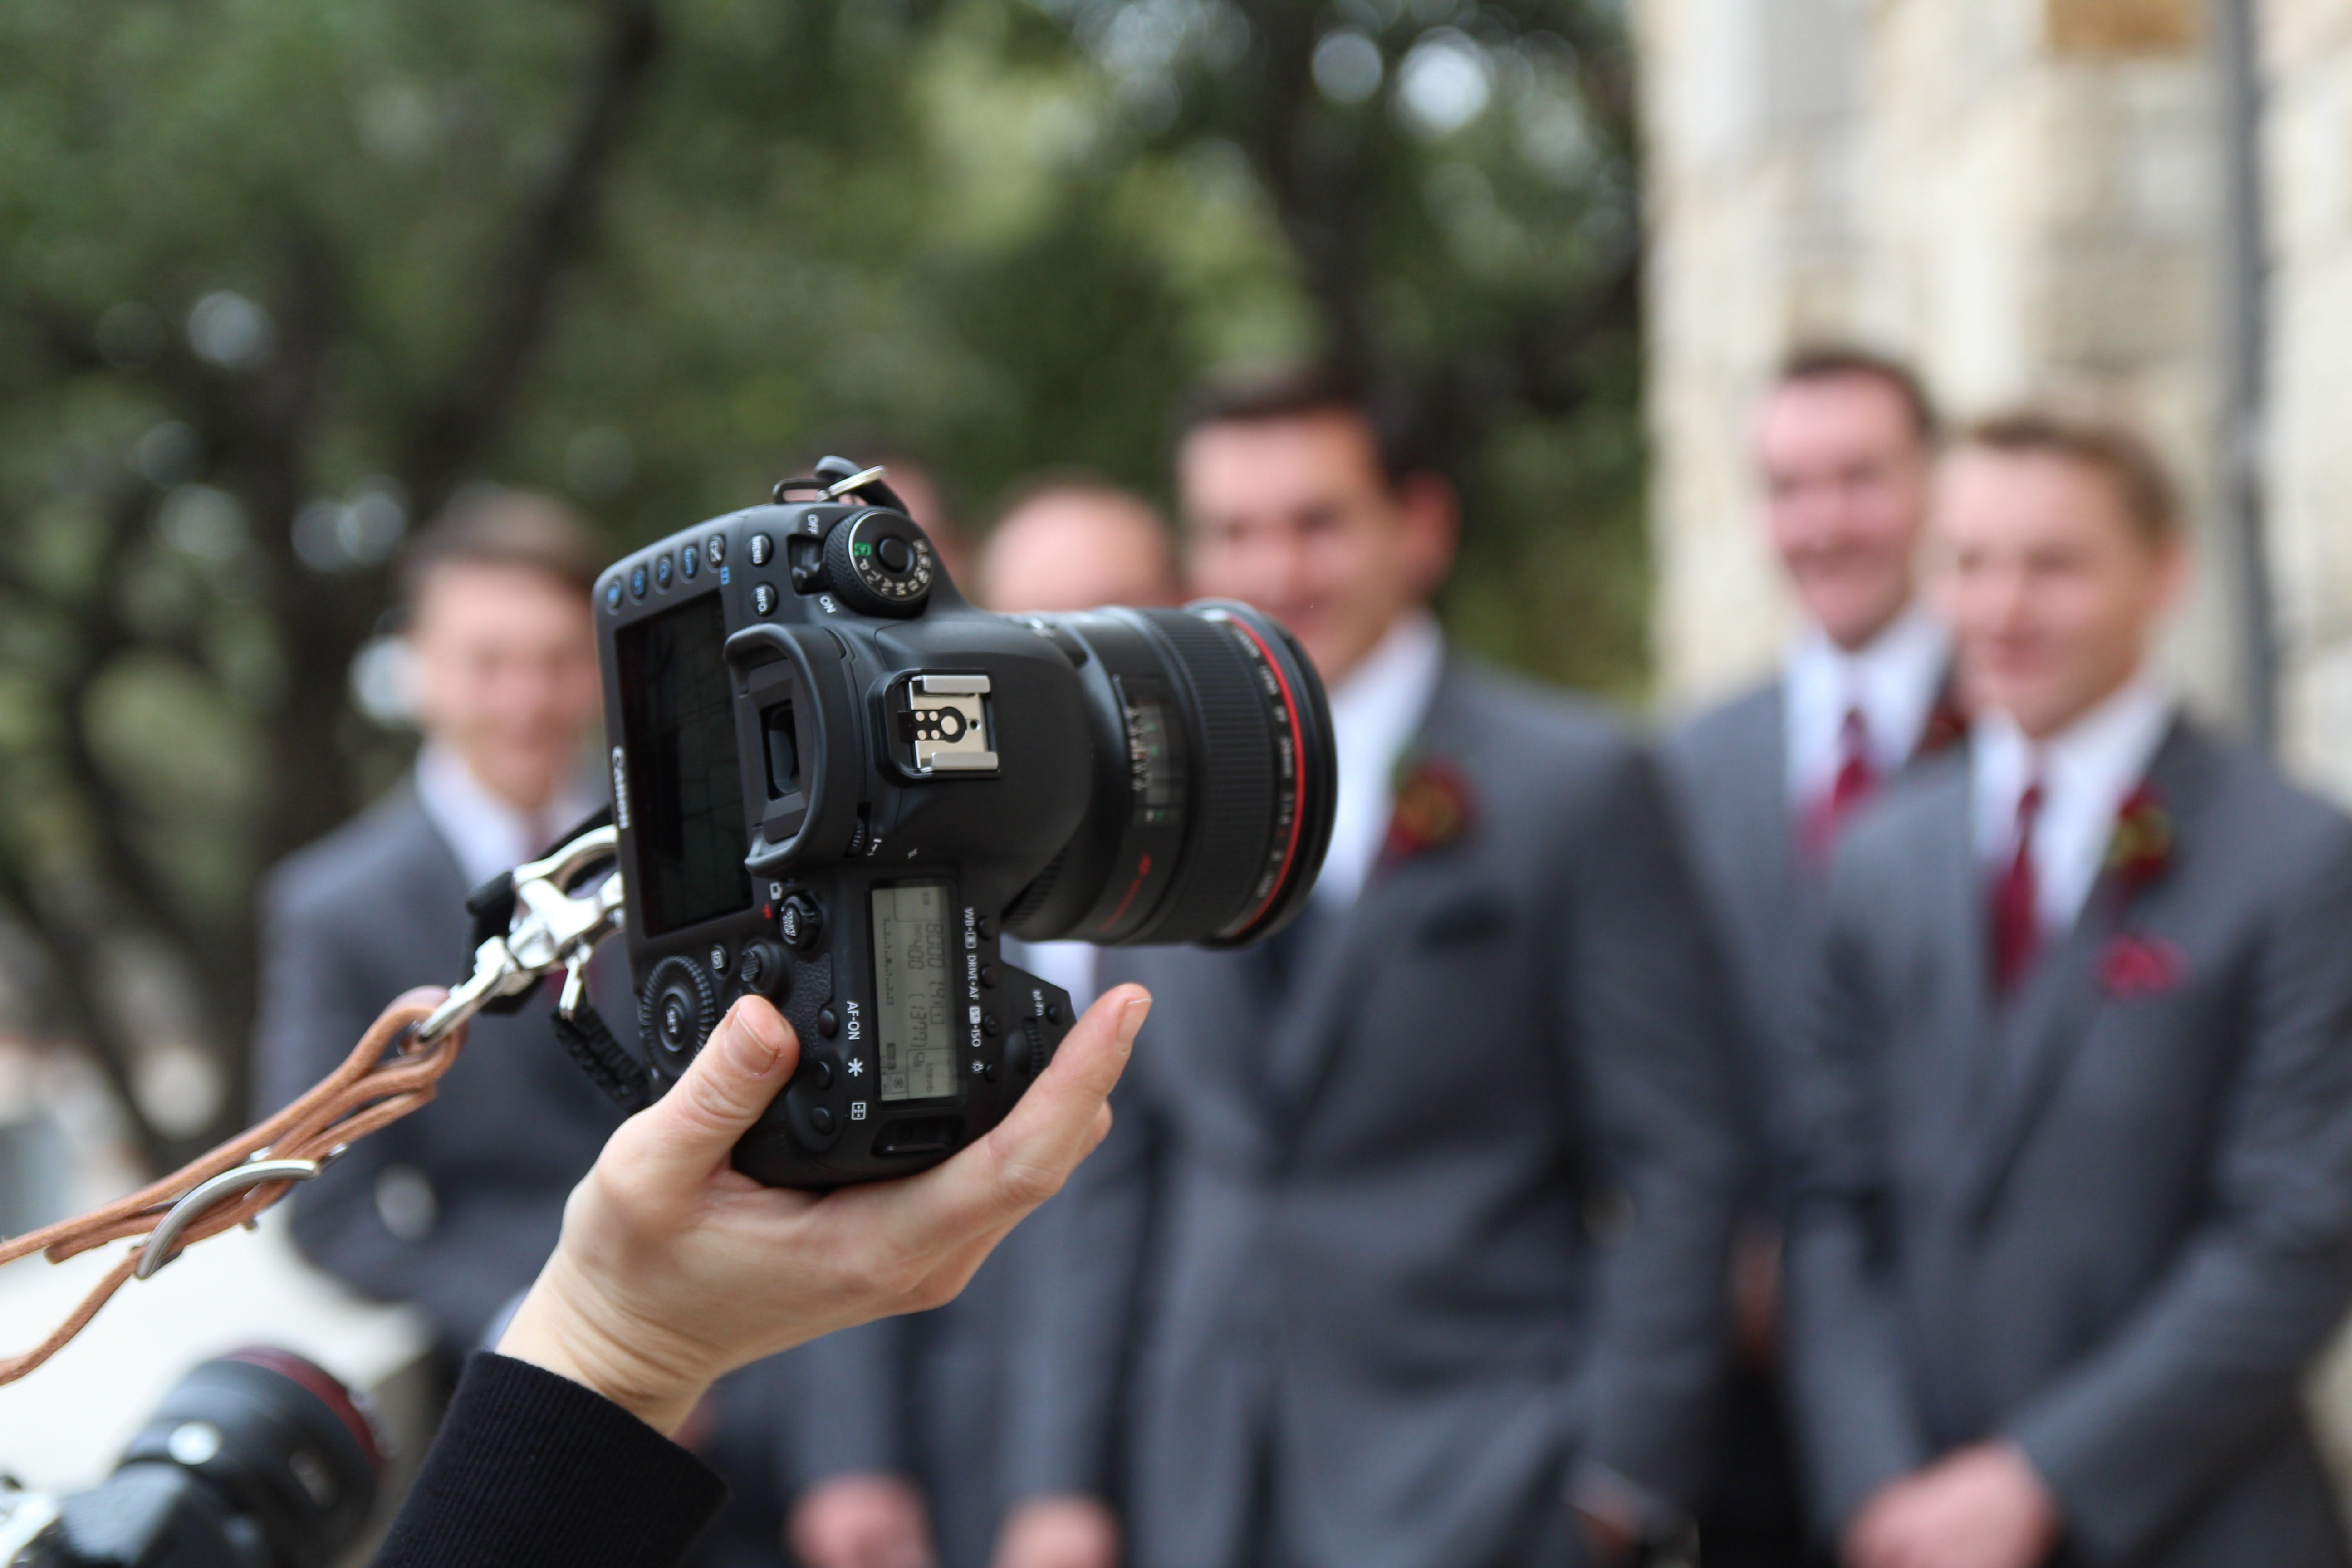 shooting photo mariage, tarif photographe mariage, photographe mariage prix